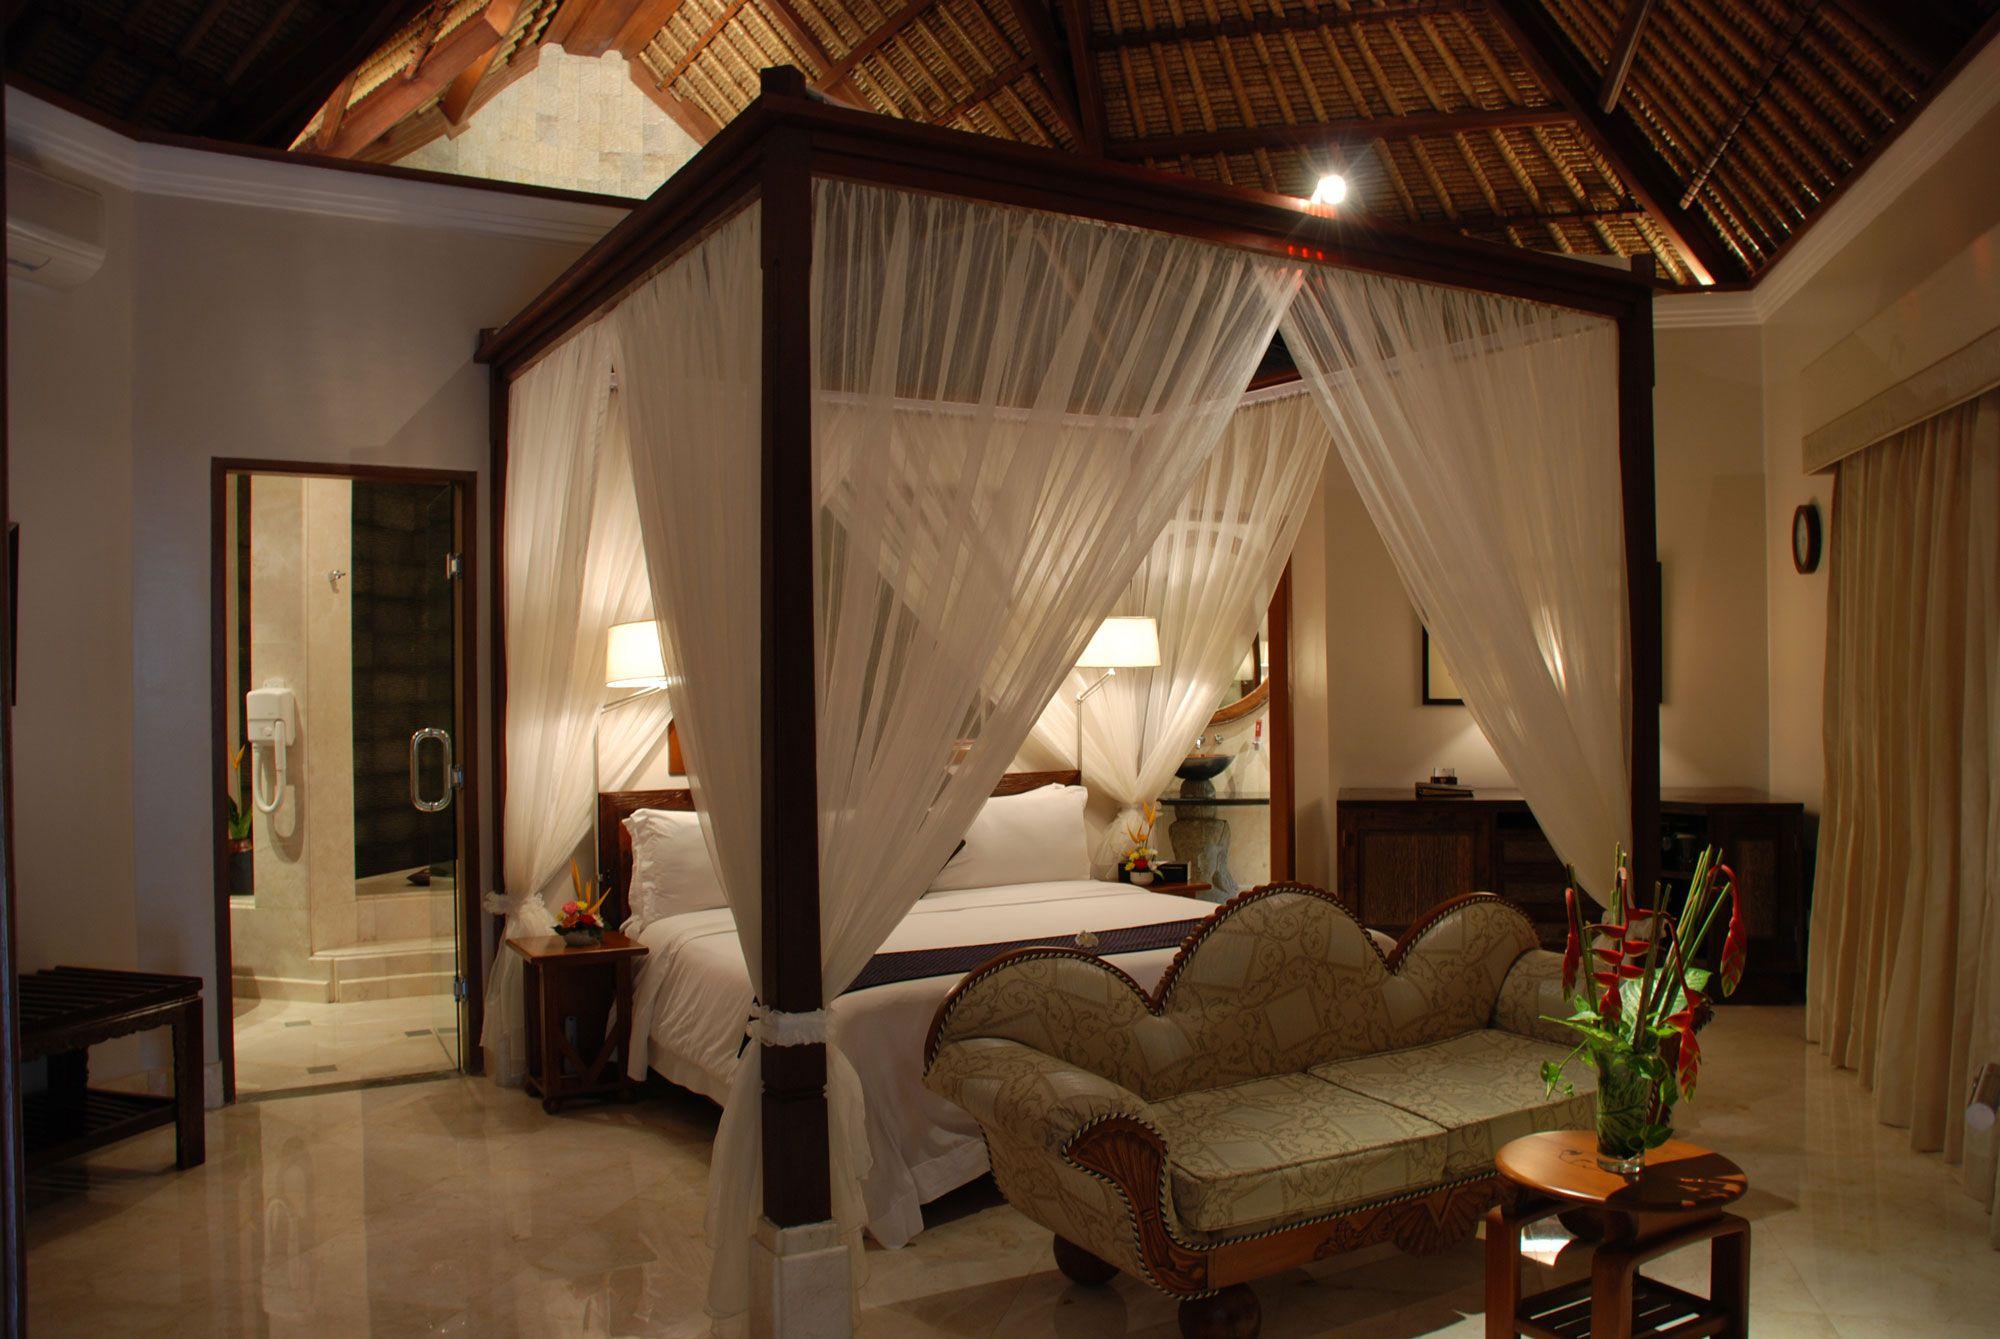 Hotel Room Design Ideas That Blend Aesthetics